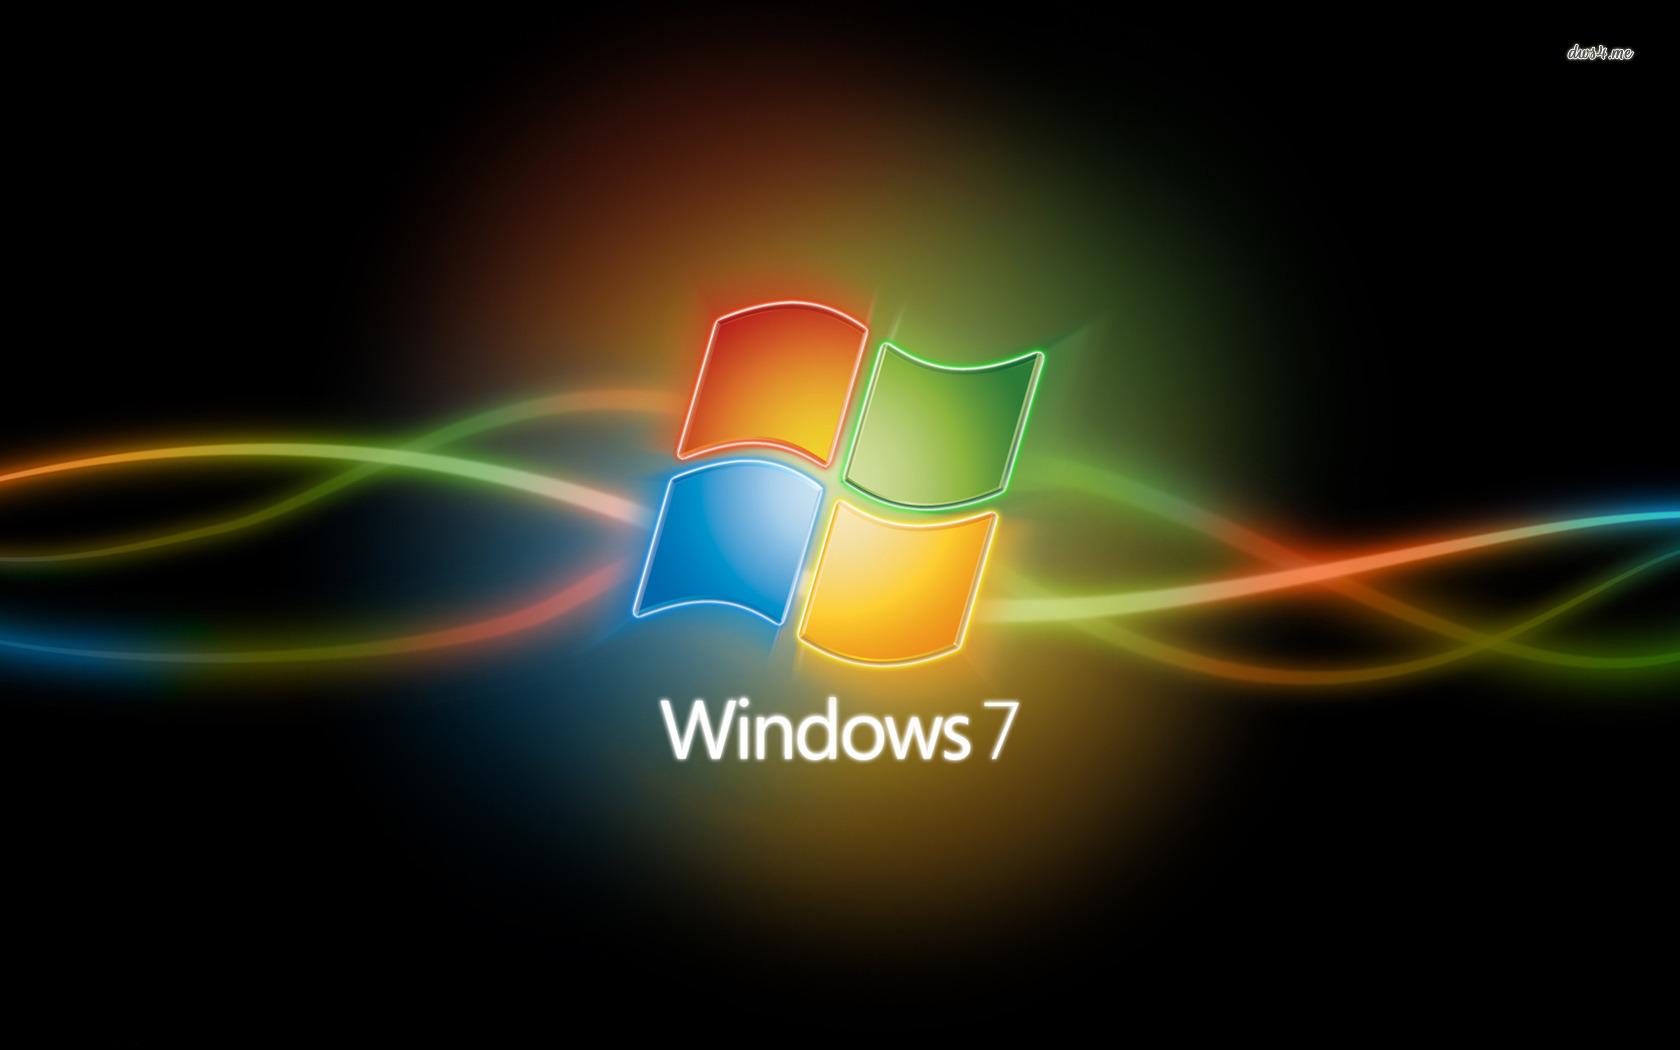 1280x800 logo windows - photo #5